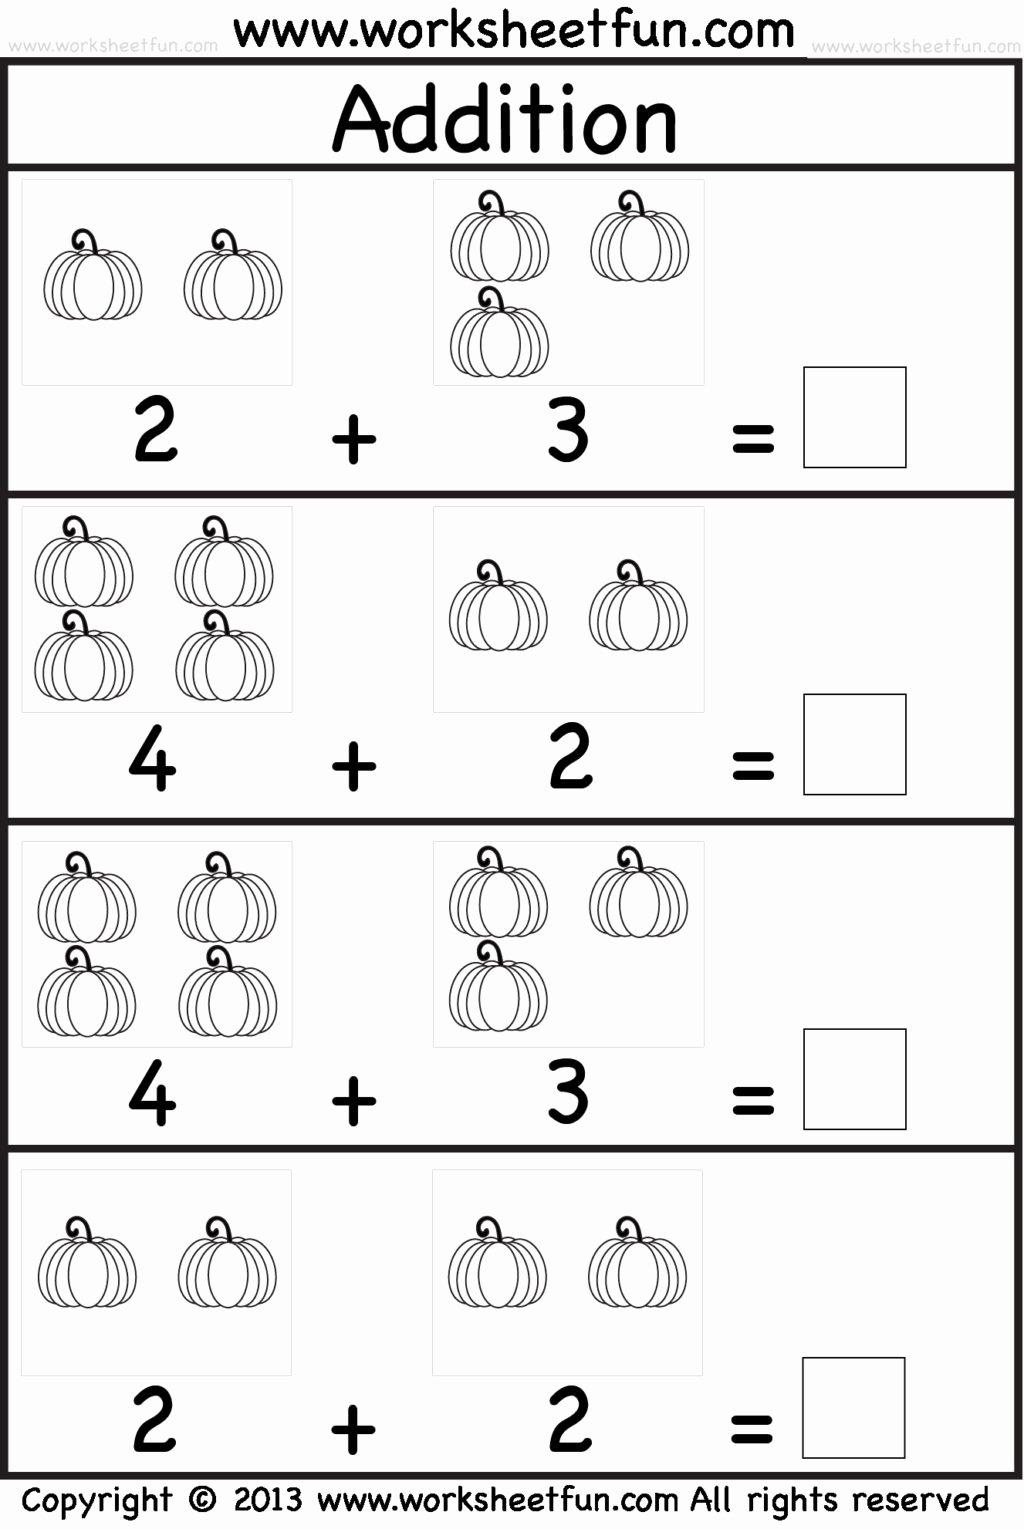 Educational Worksheets for Preschoolers Lovely Worksheet Education Creations Educational Worksheets Free